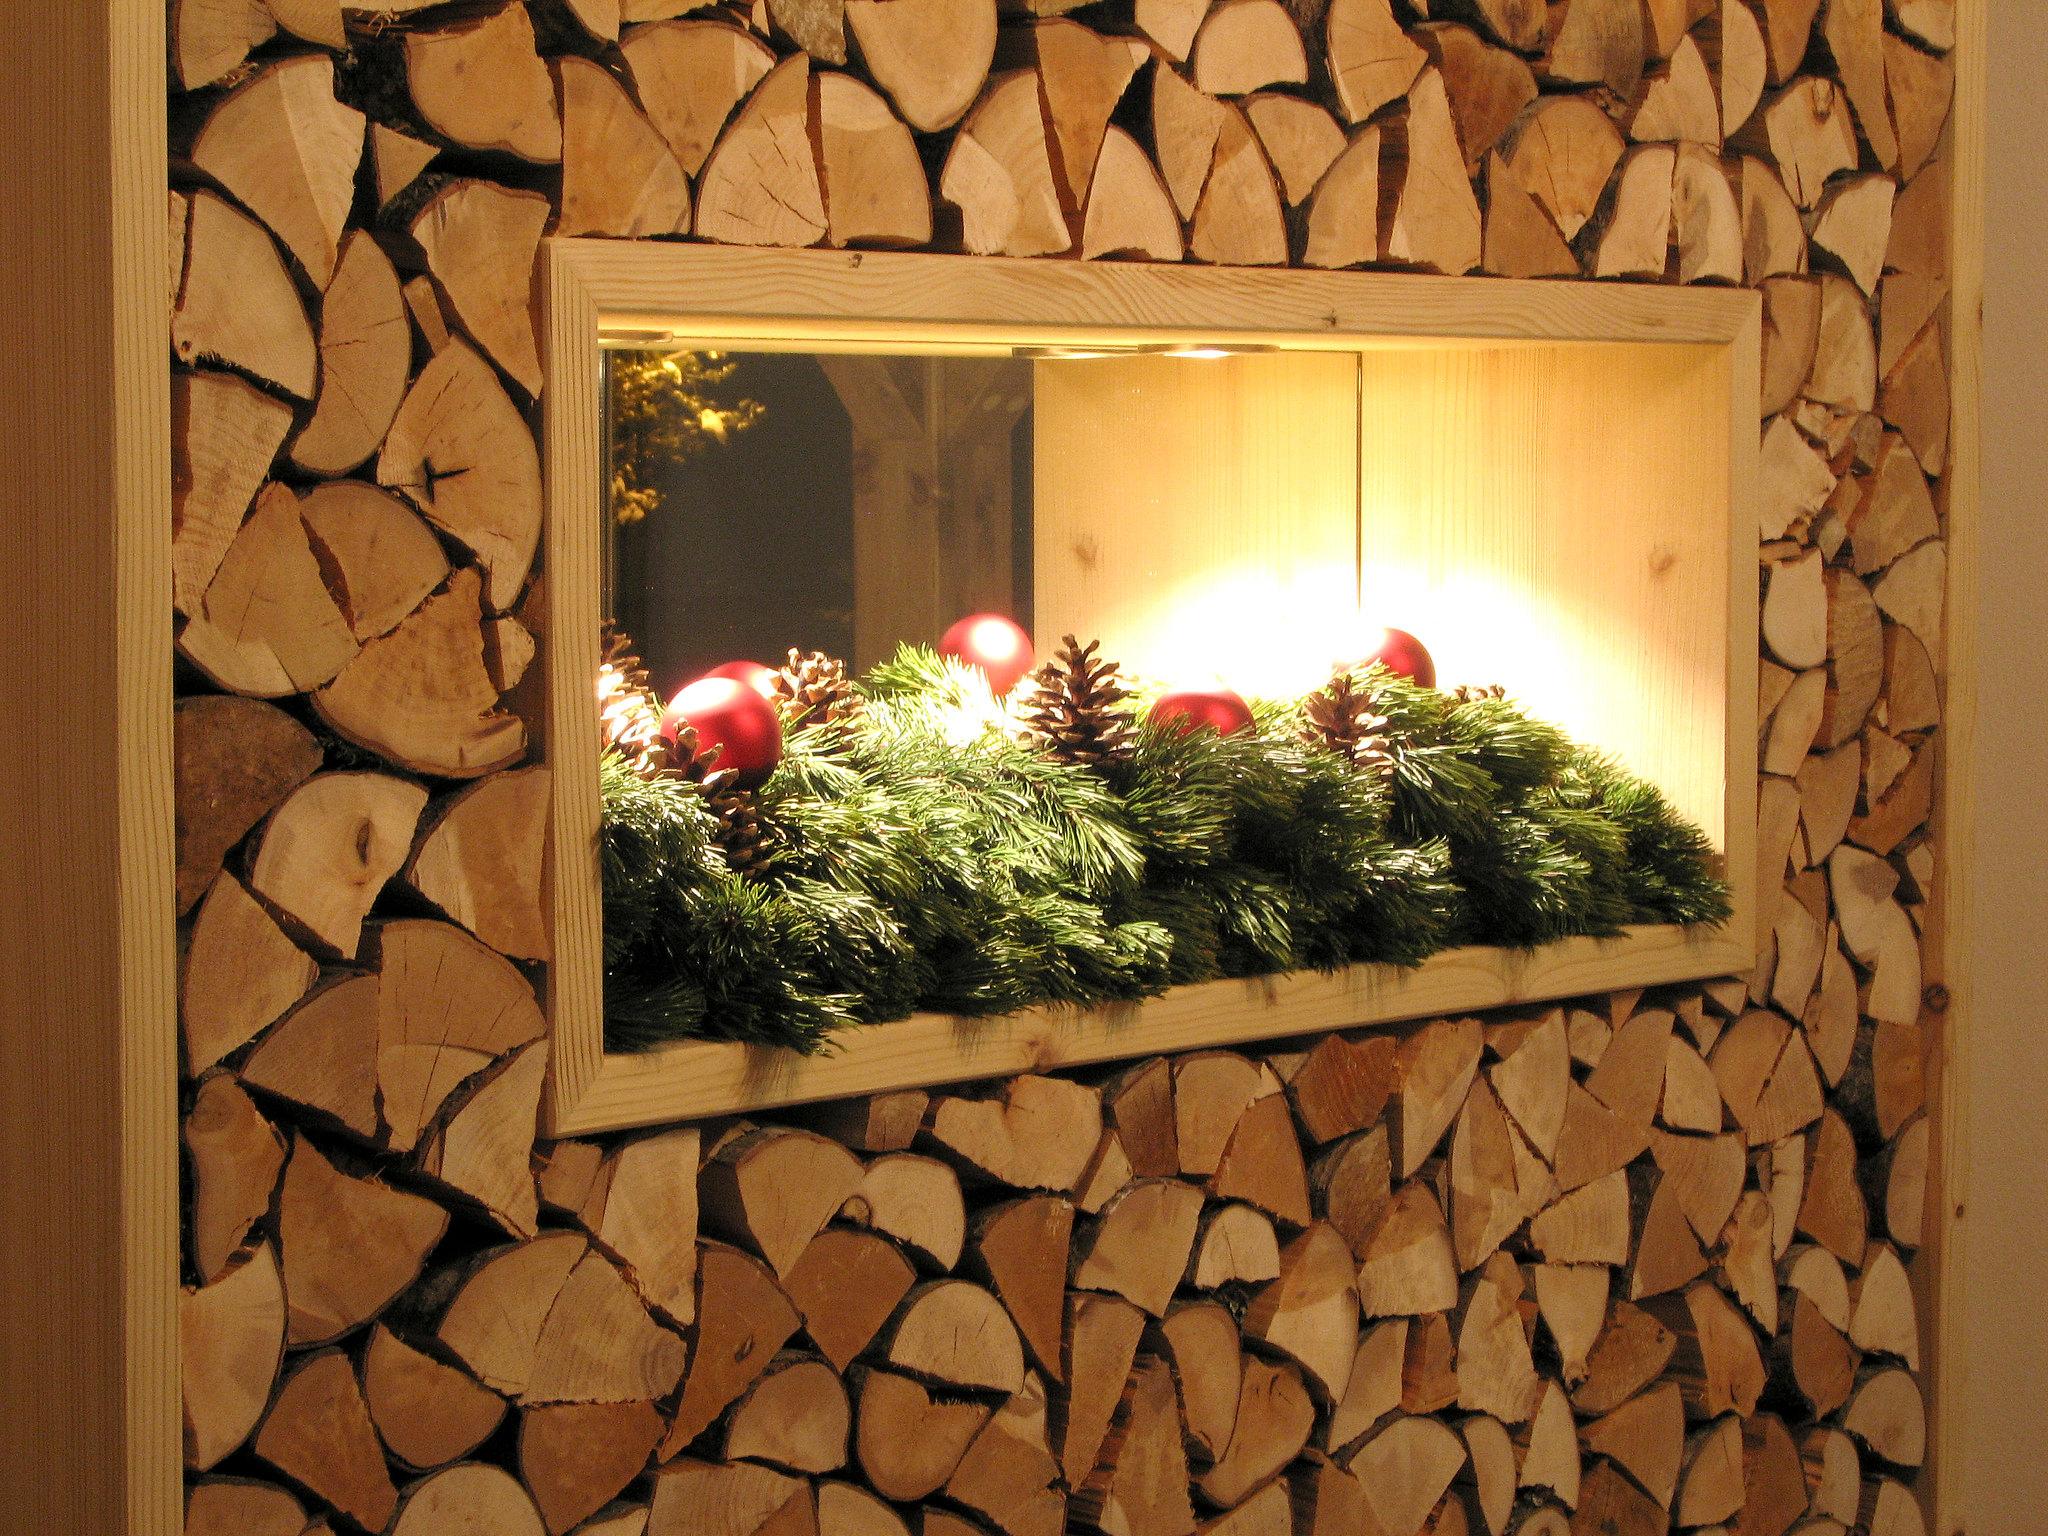 Urlaub im Advent in Saalbach-Hinterglemm